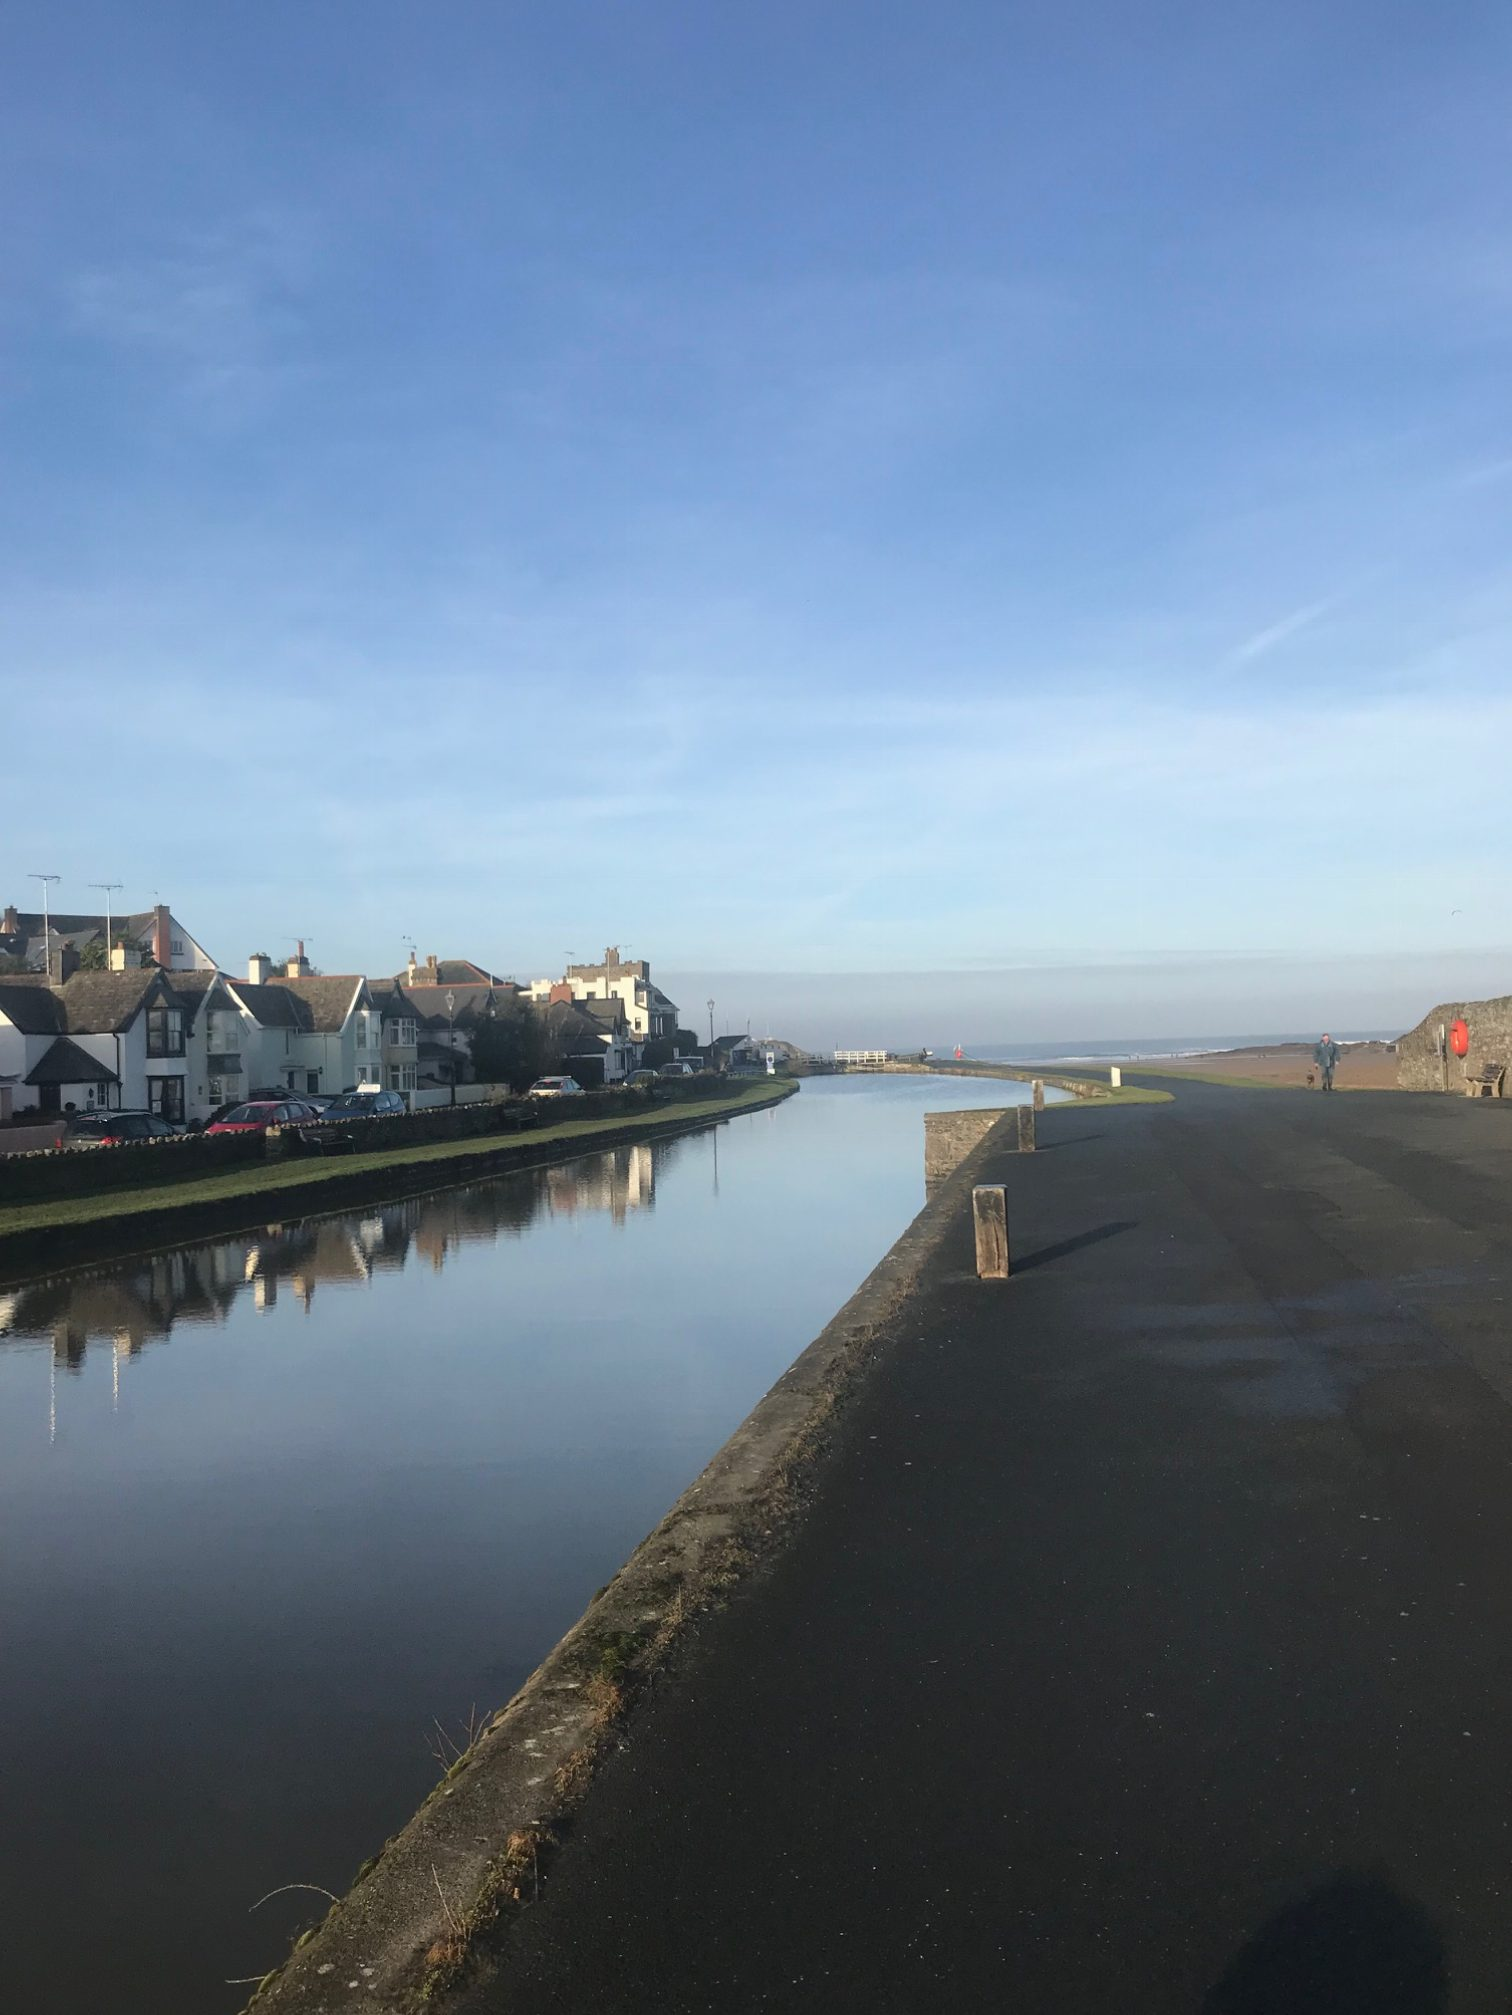 Walk along Bude canal from Marhamchurch to Summerleaze beach.